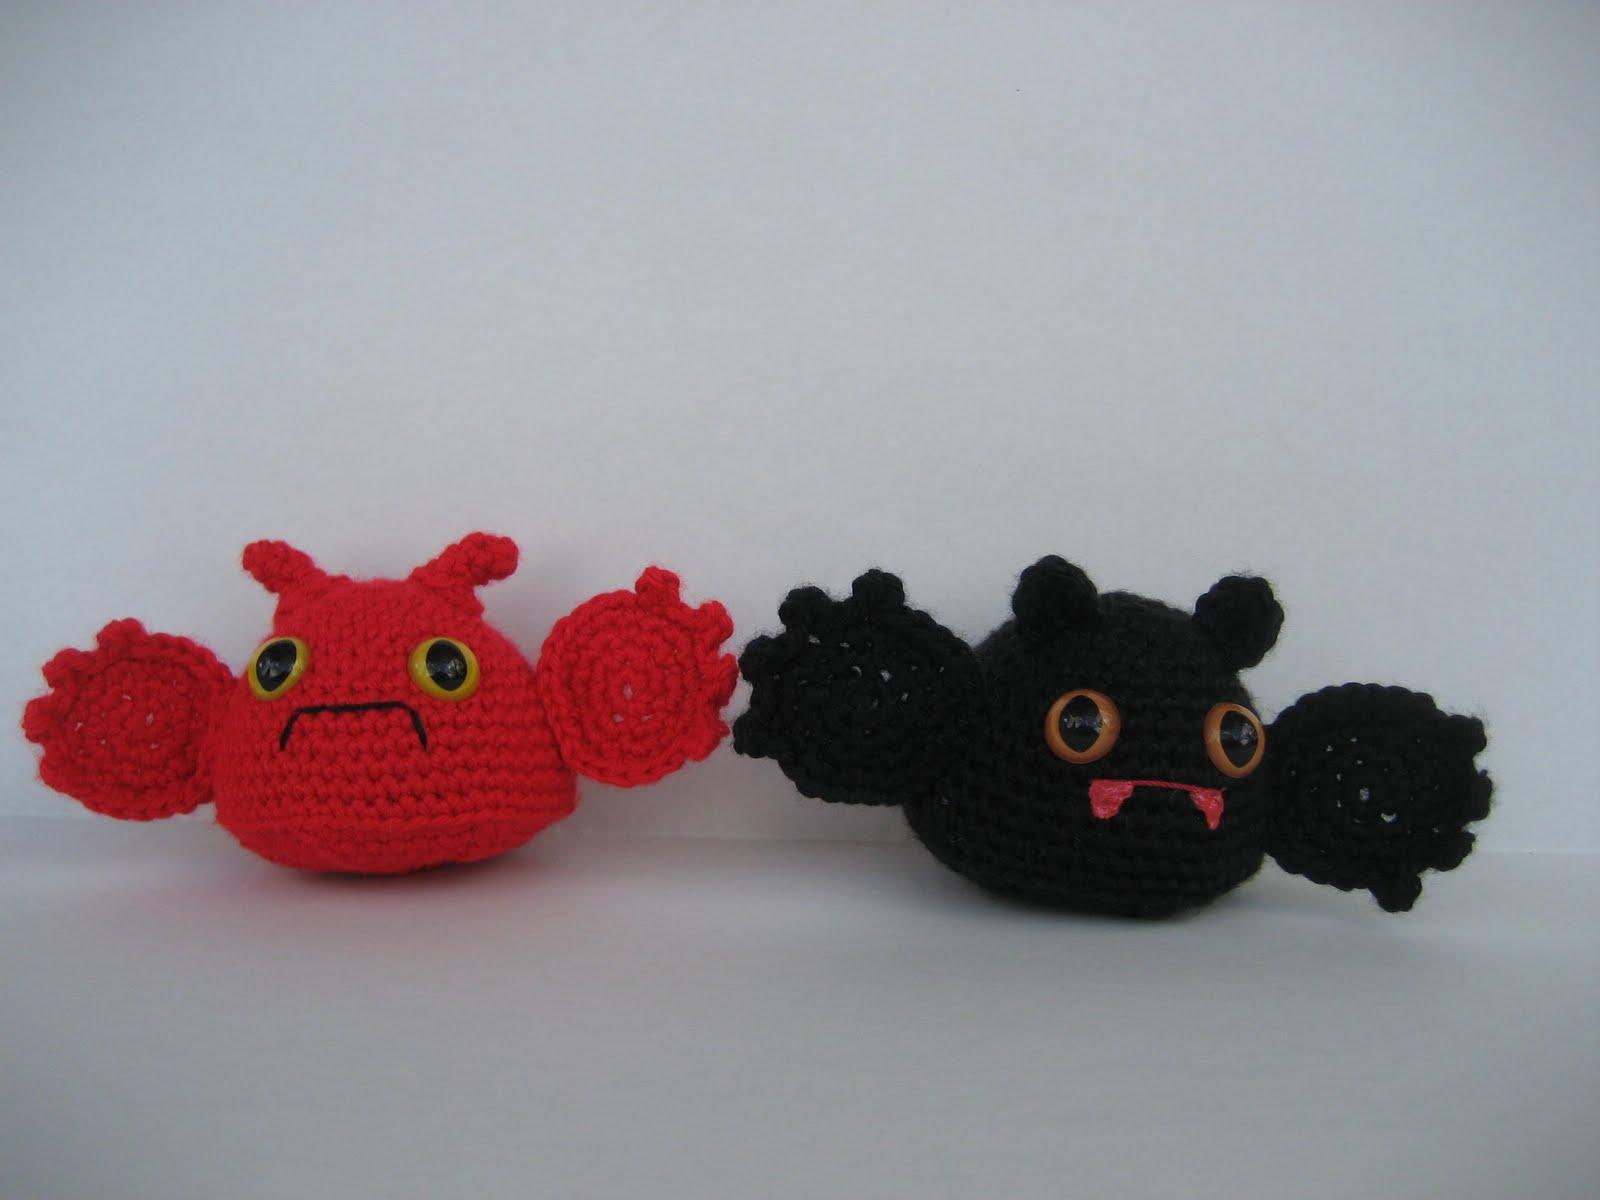 Make Amigurumi Bat Crochet : 2000 Free Amigurumi Patterns: Little Bats